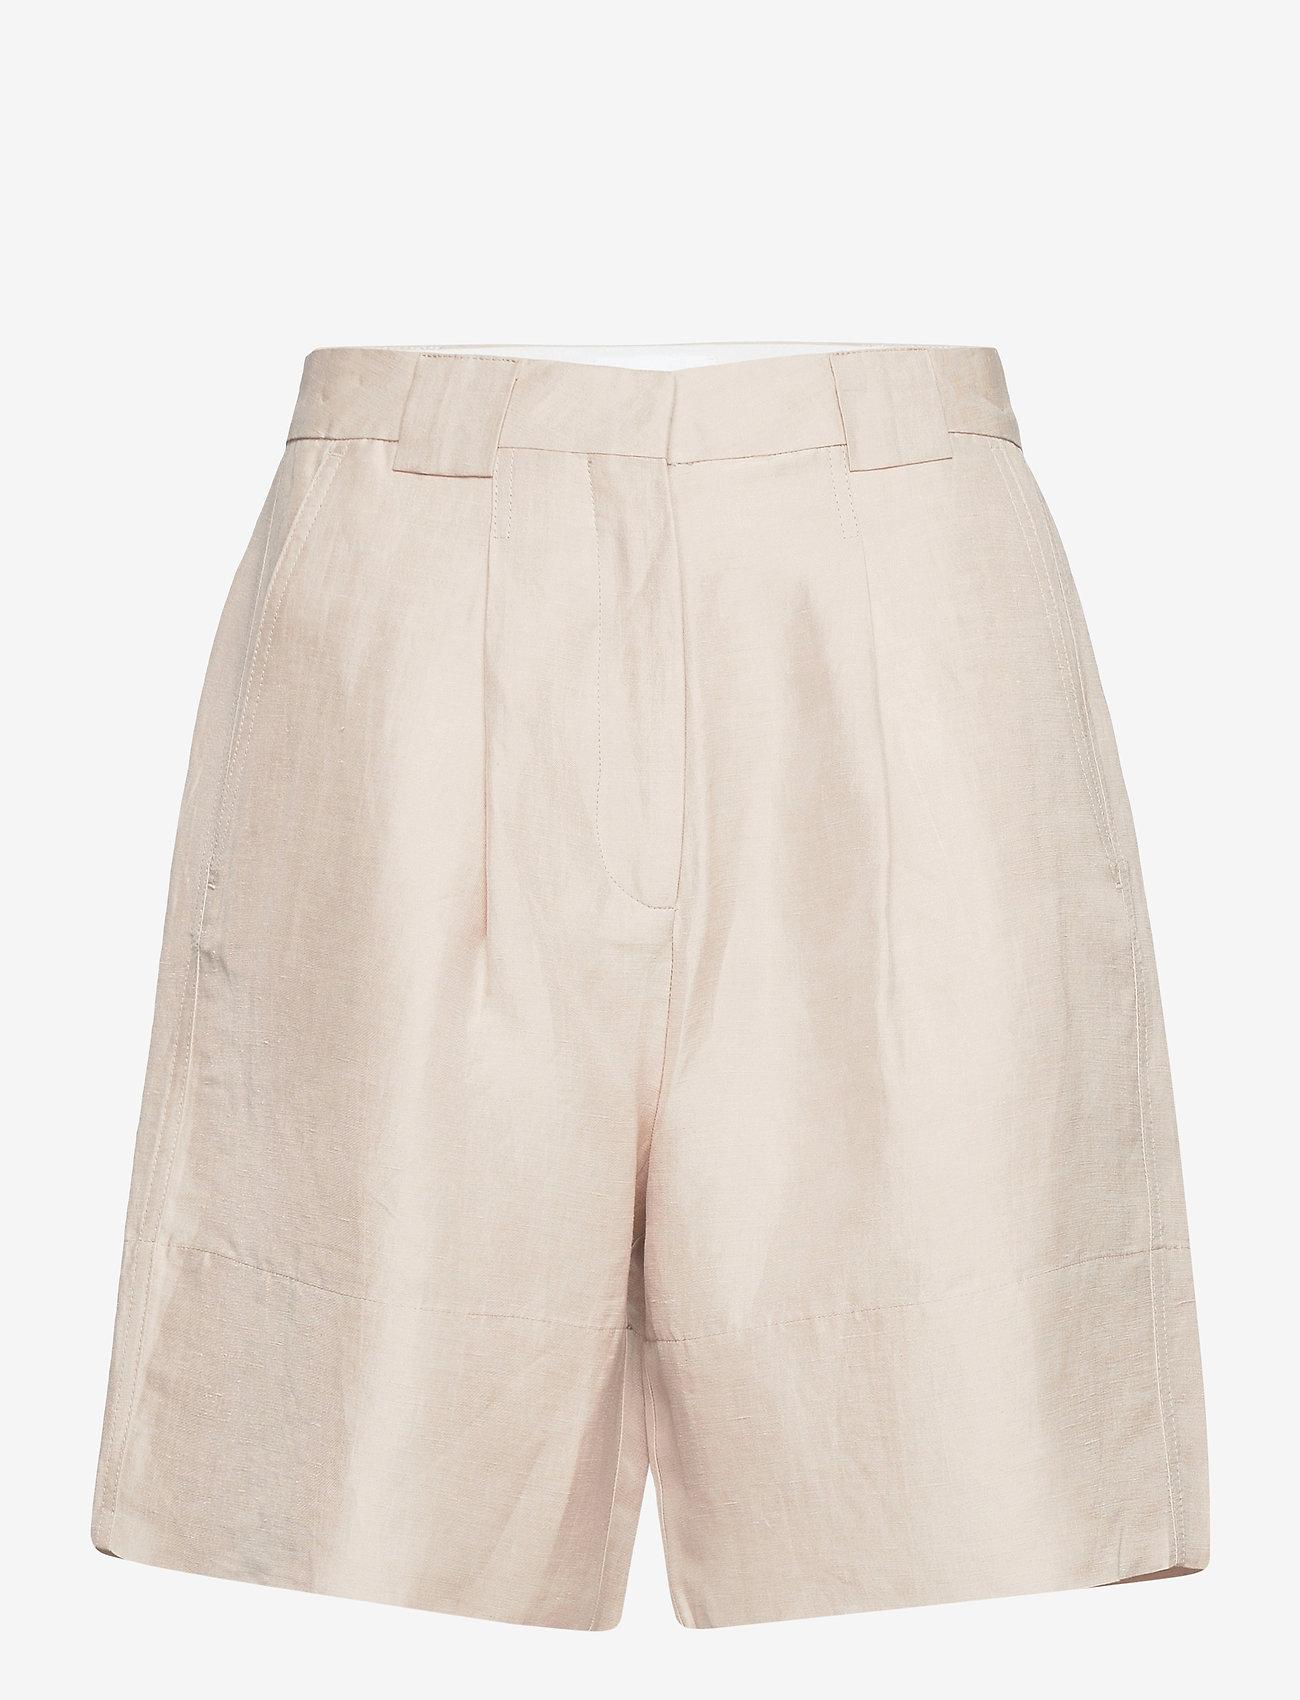 Soulland - Liv shorts - bermudas - beige - 1